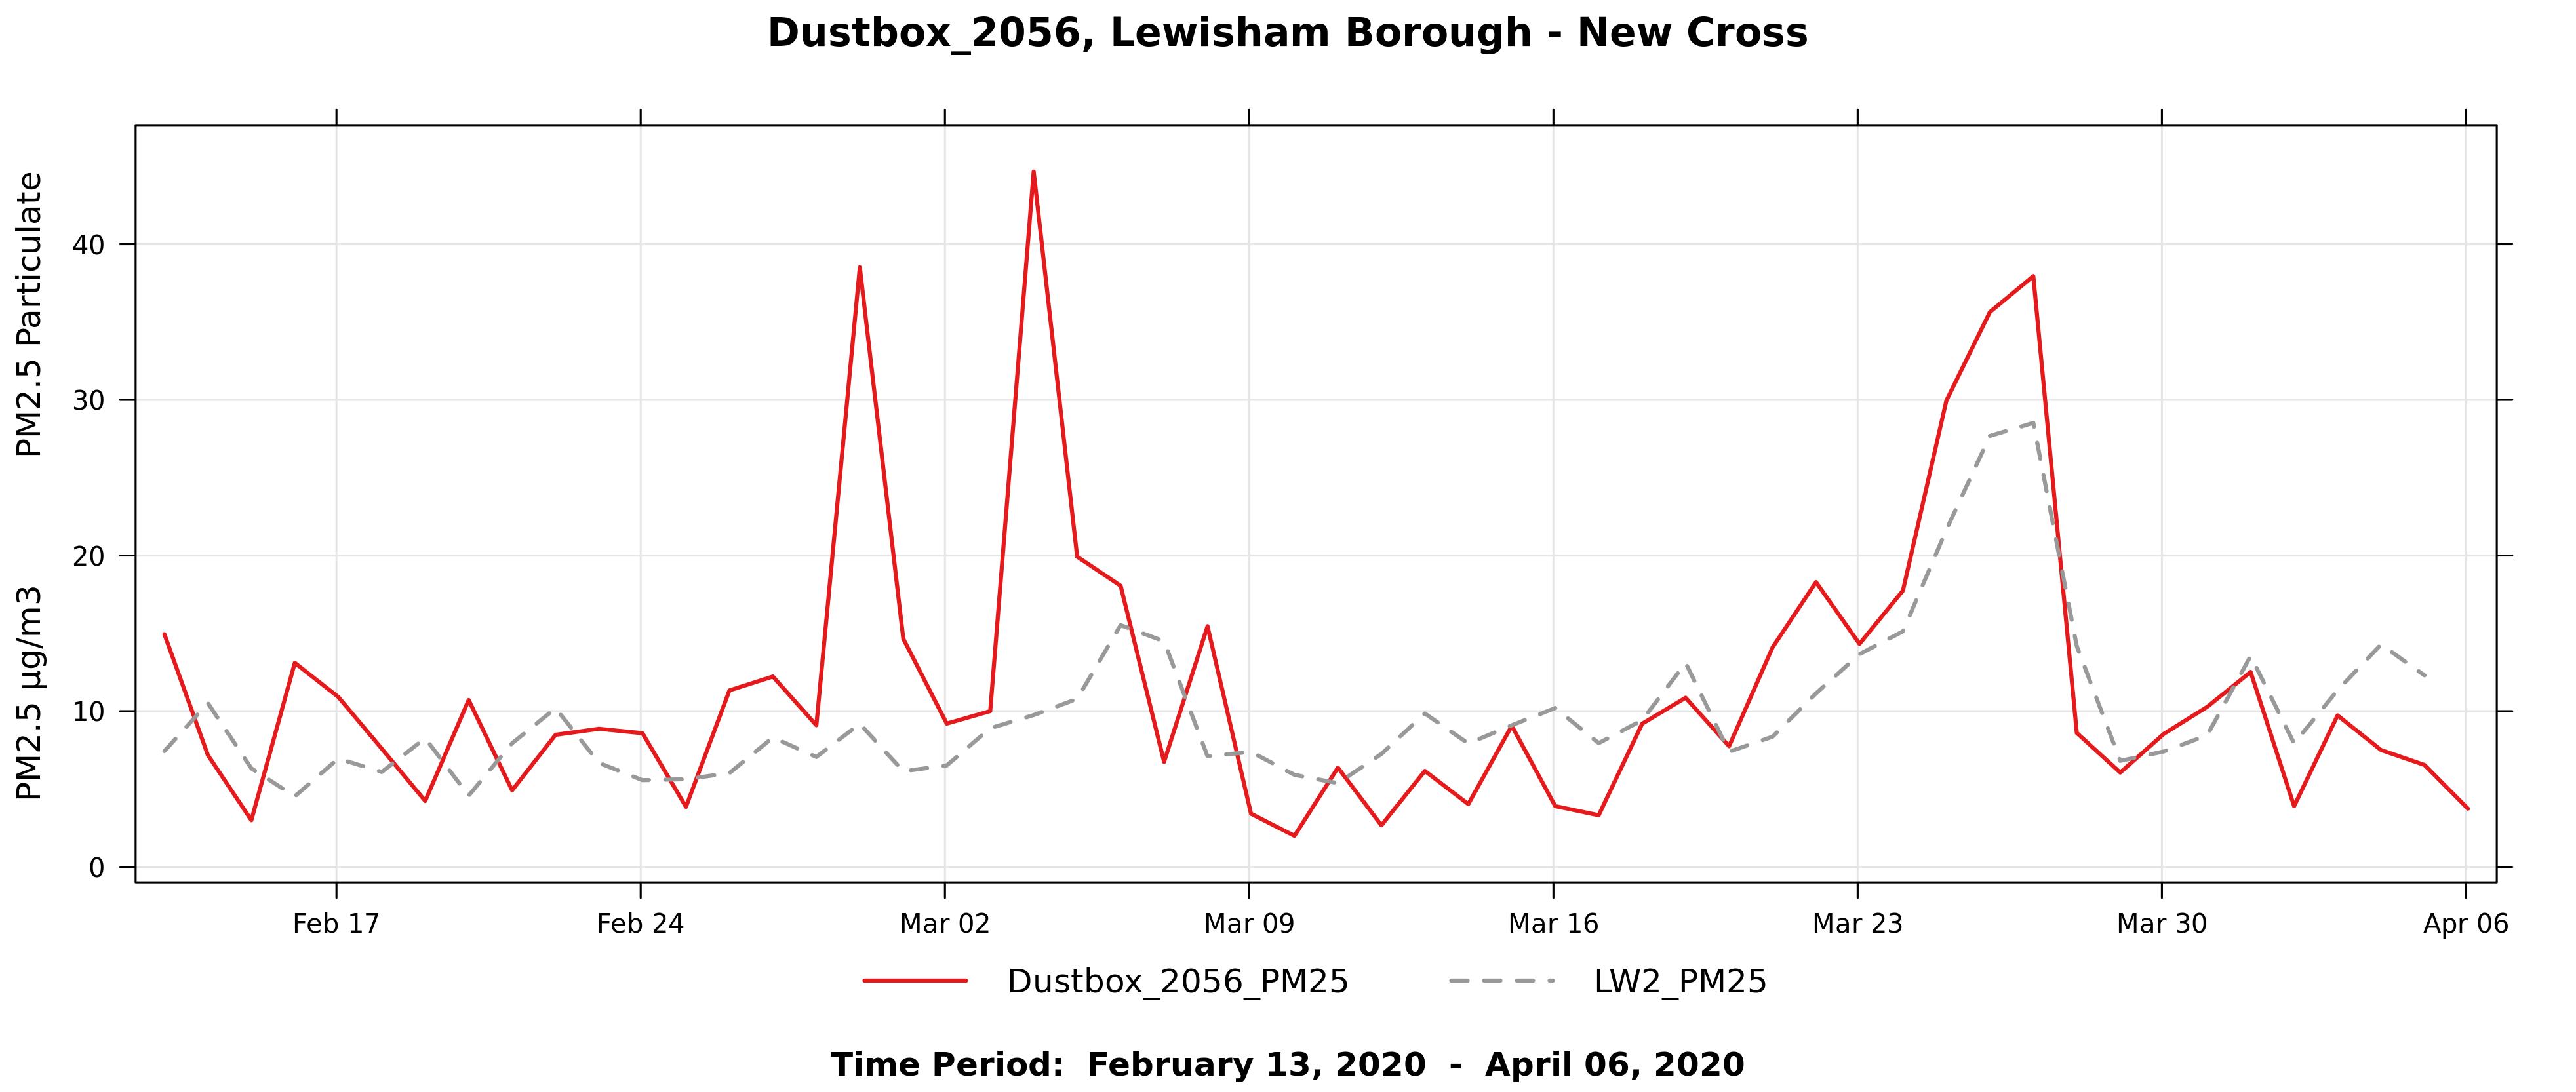 Figure11_Dustbox_2056_NXG_LinePlot